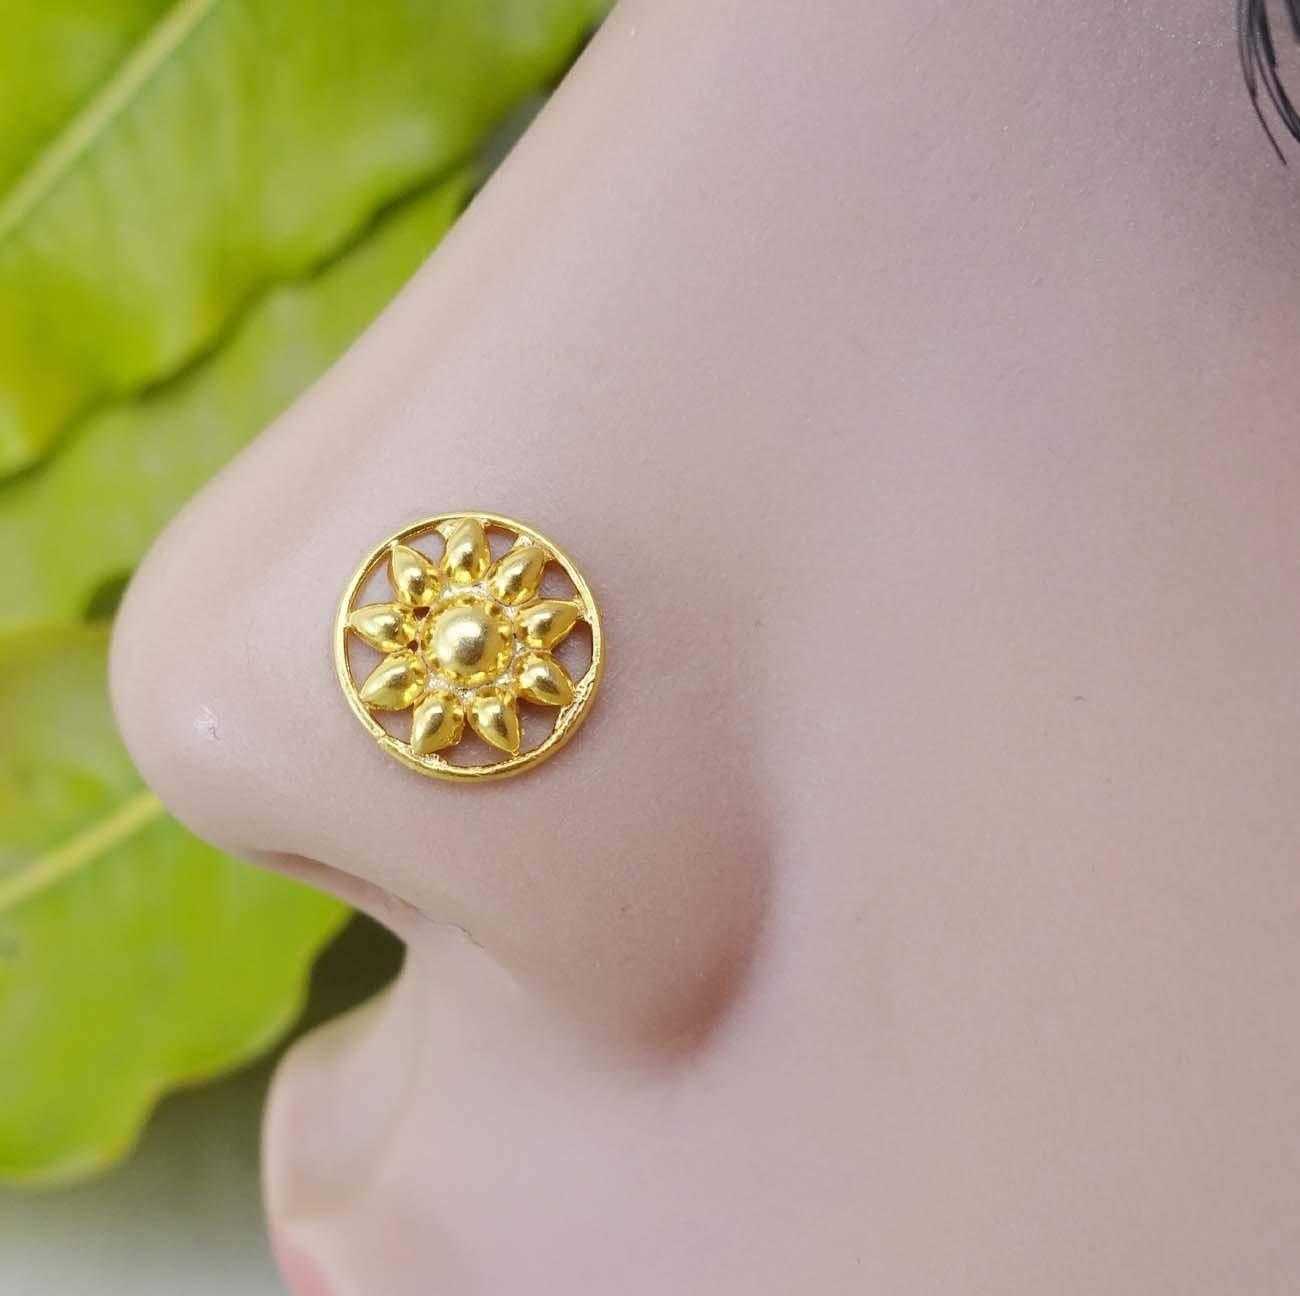 Cheap Flat Gold Nose Stud Find Flat Gold Nose Stud Deals On Line